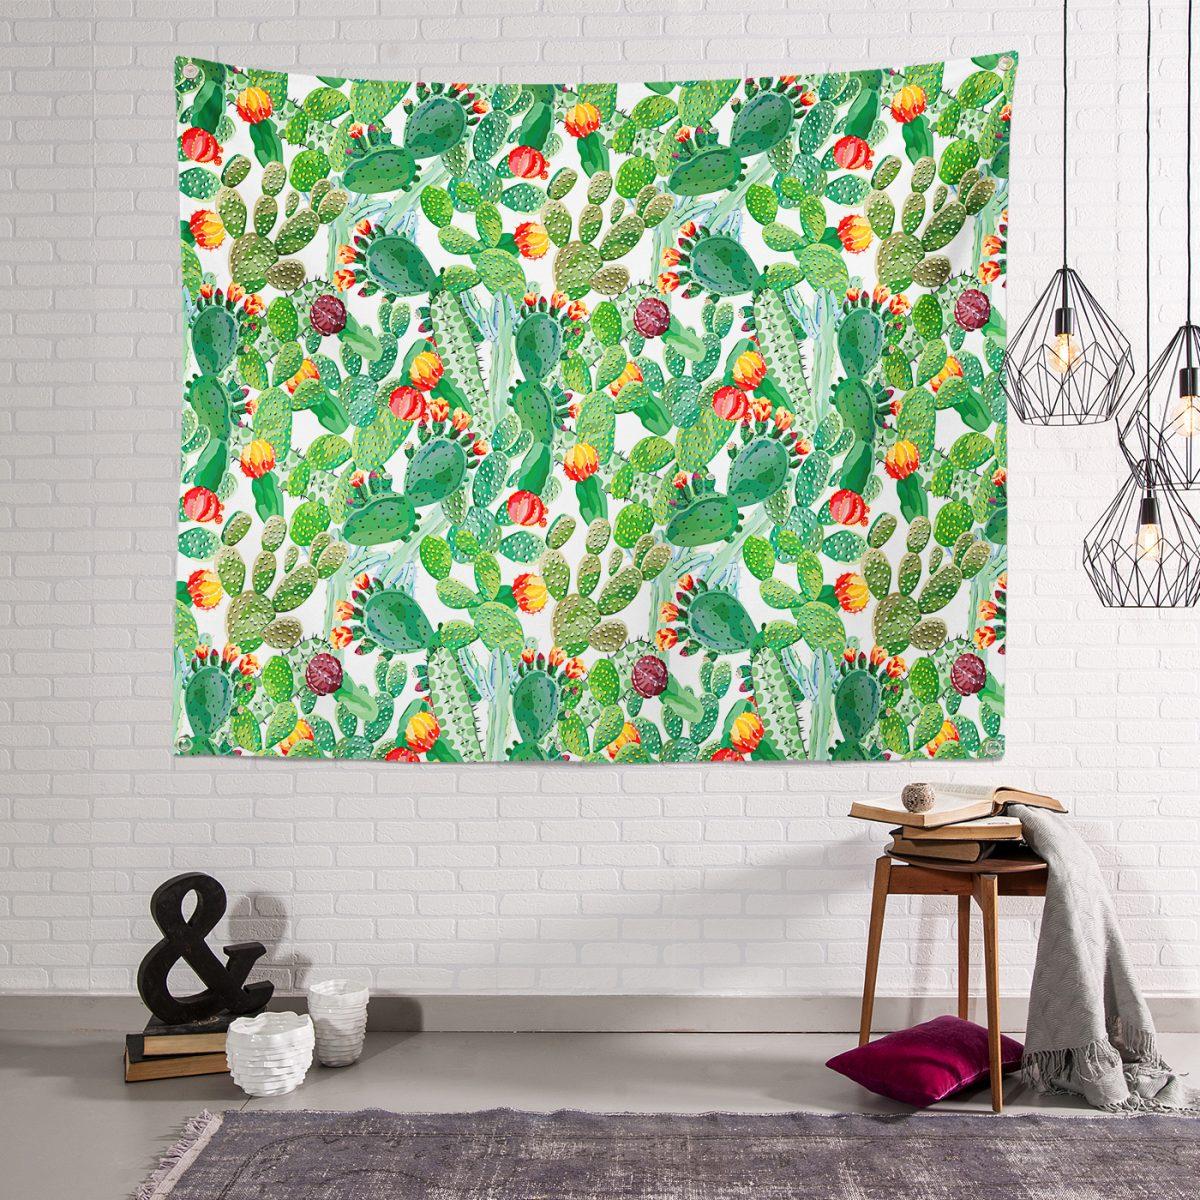 RealHomes Özel Tasarımlı Dijital Baskılı Modern Tasarım Tapestry Duvar Örtüsü Realhomes